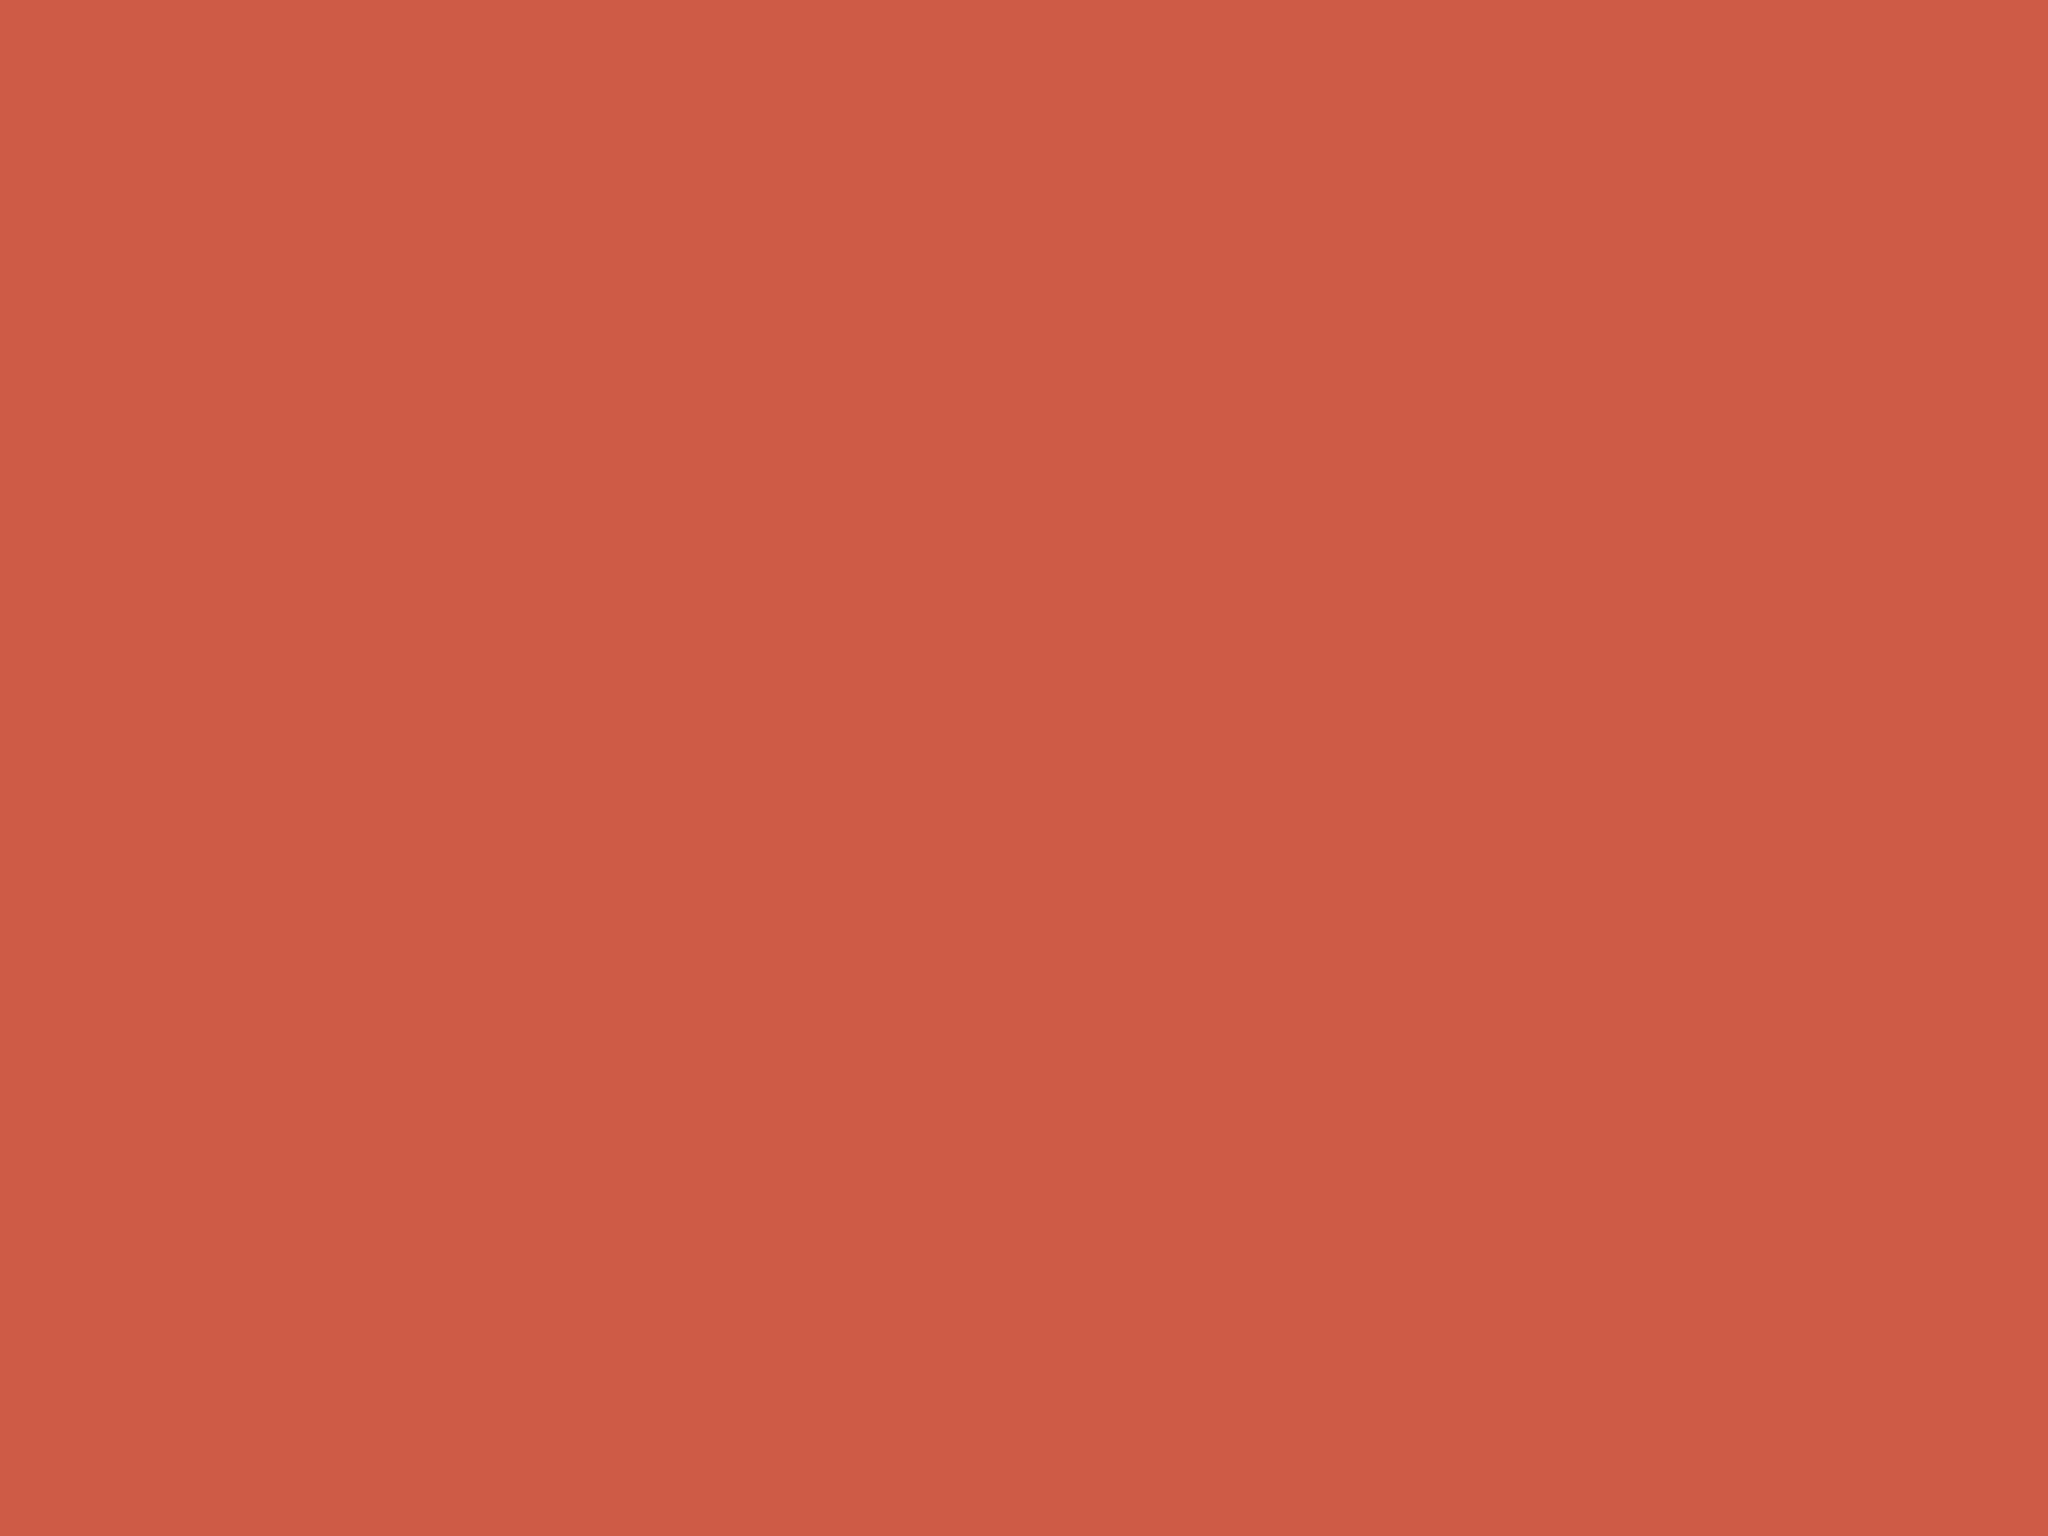 2048x1536 Dark Coral Solid Color Background